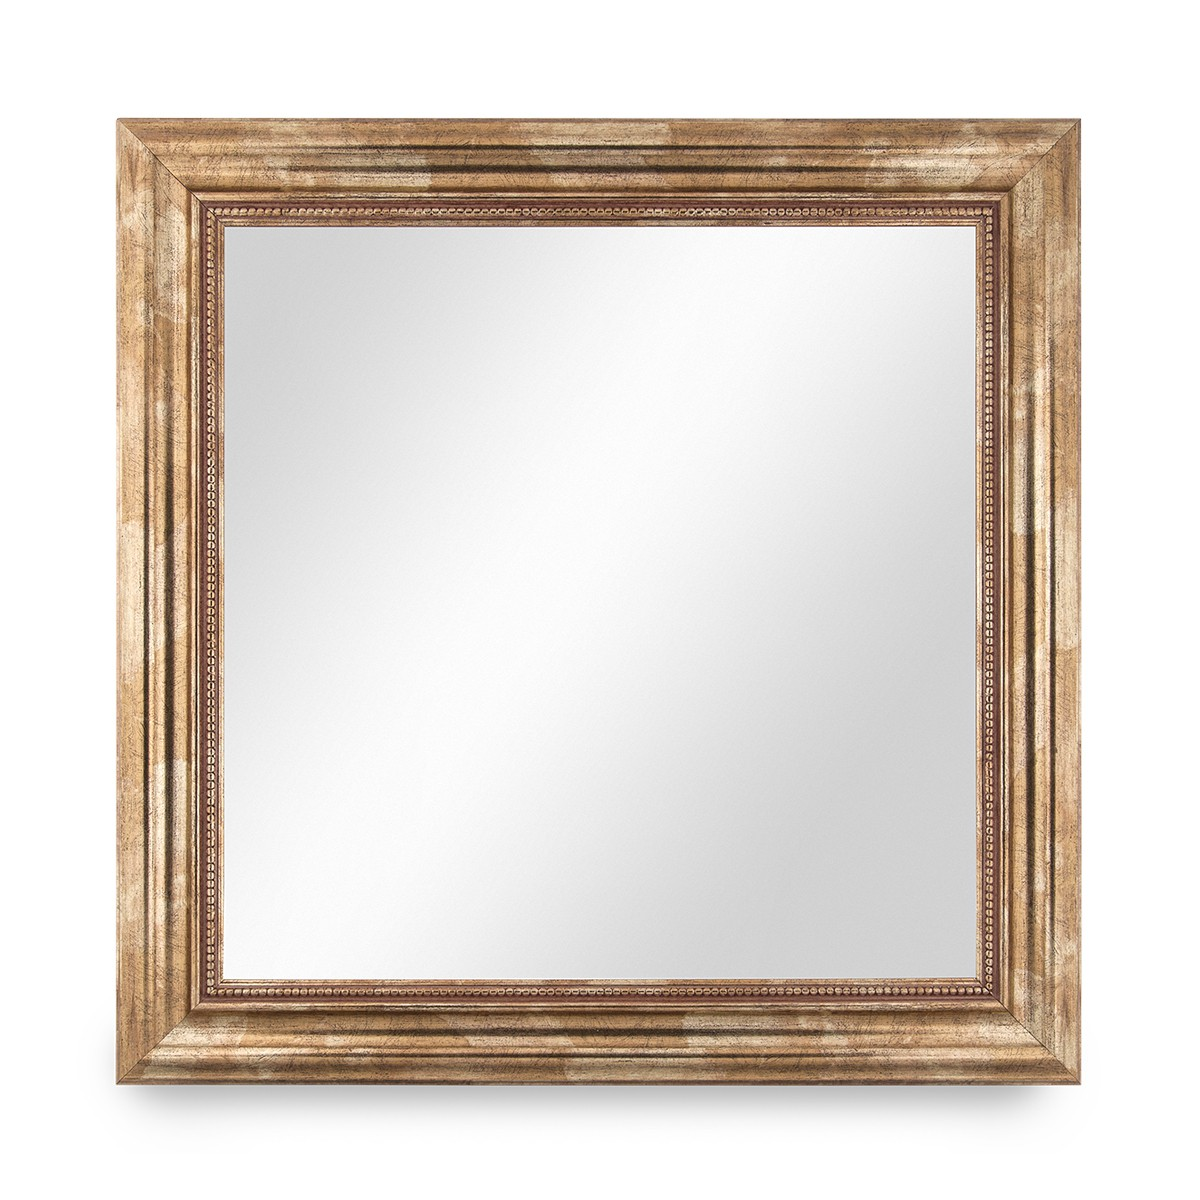 Wand-Spiegel 50x50 cm im Massivholz-Rahmen Barock-Stil Antik Gold ...